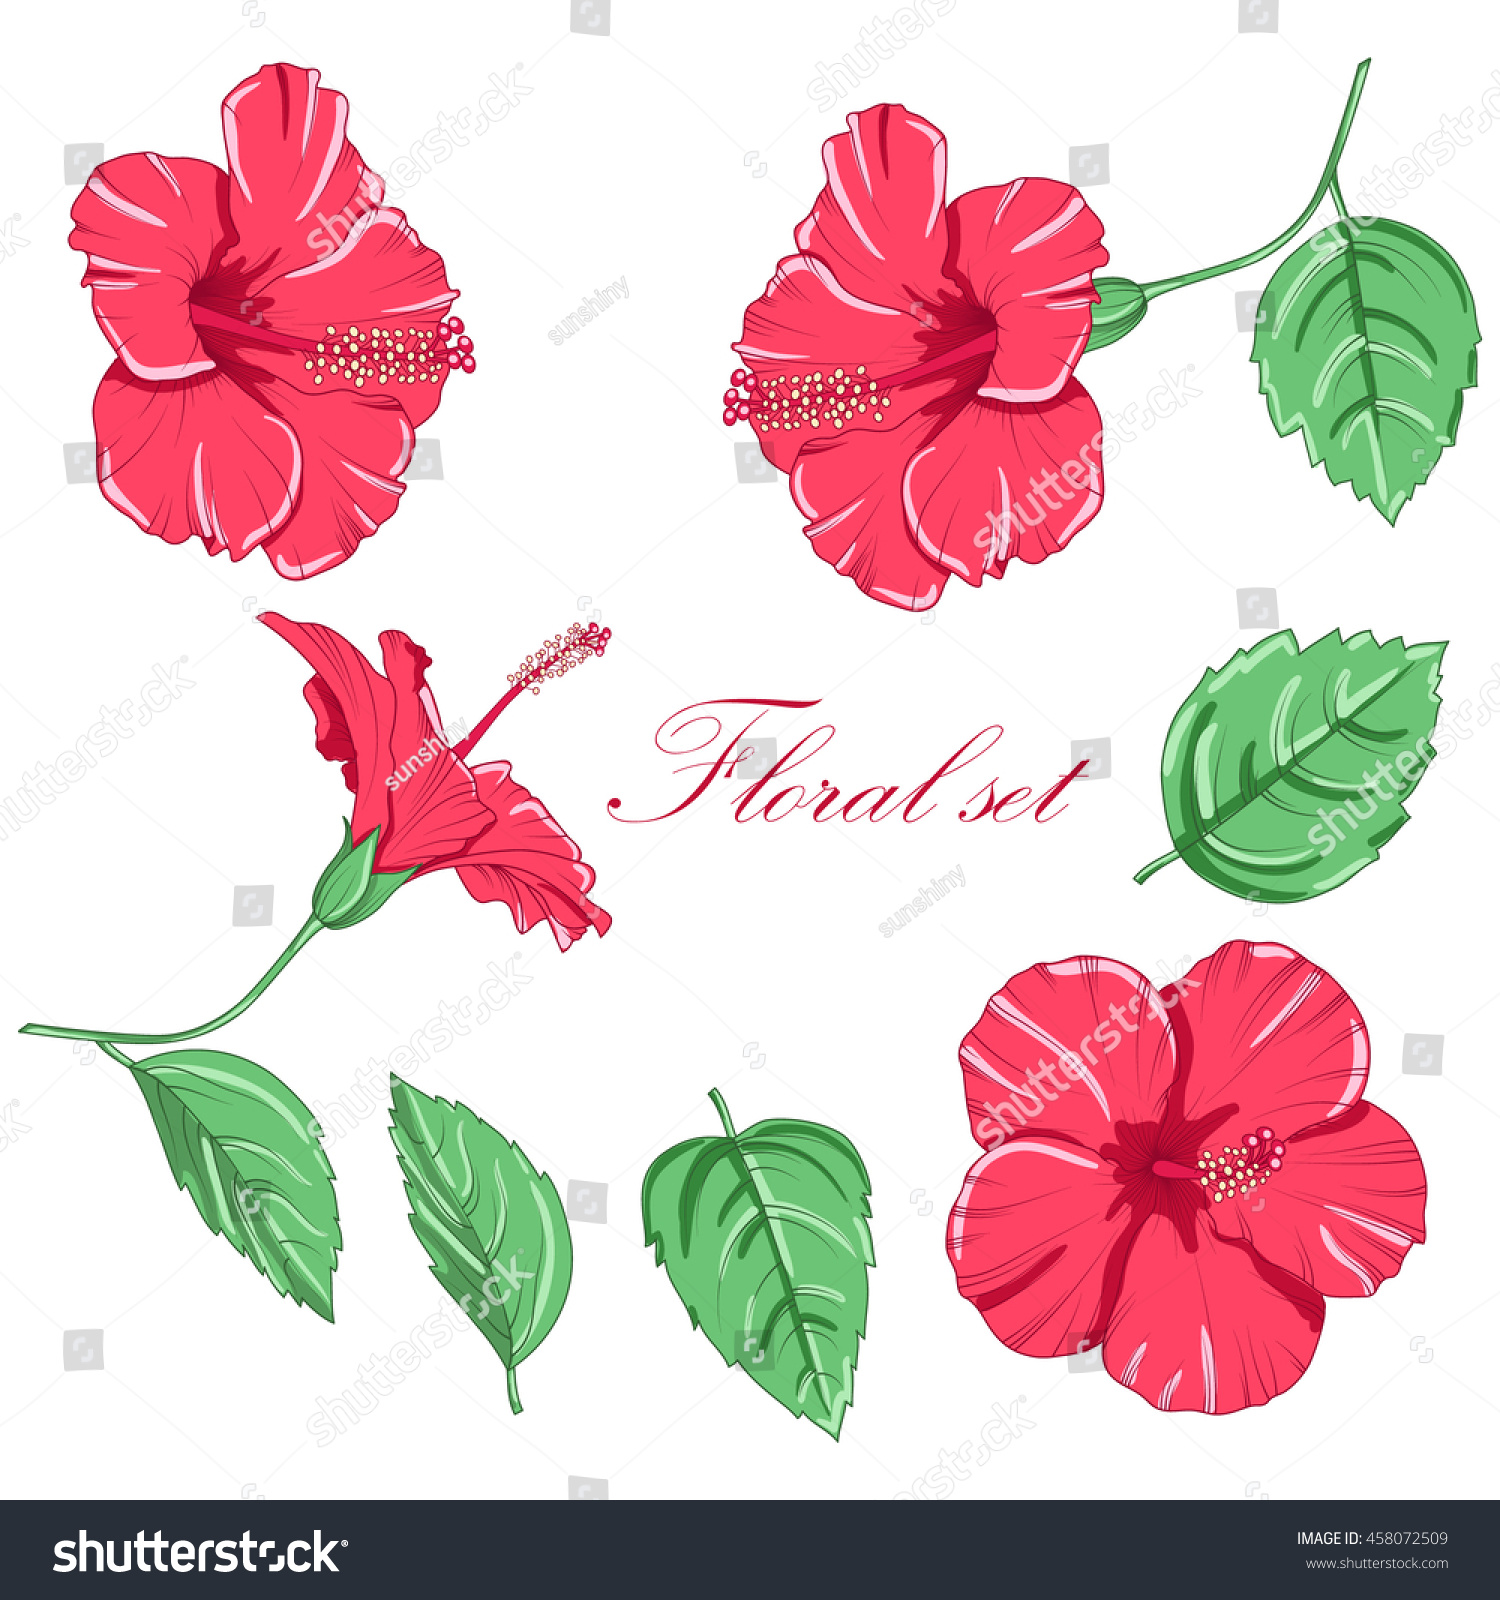 Drawn hibiscus flowers isolated on white stock vector 2018 drawn hibiscus flowers isolated on white background vector illustration izmirmasajfo